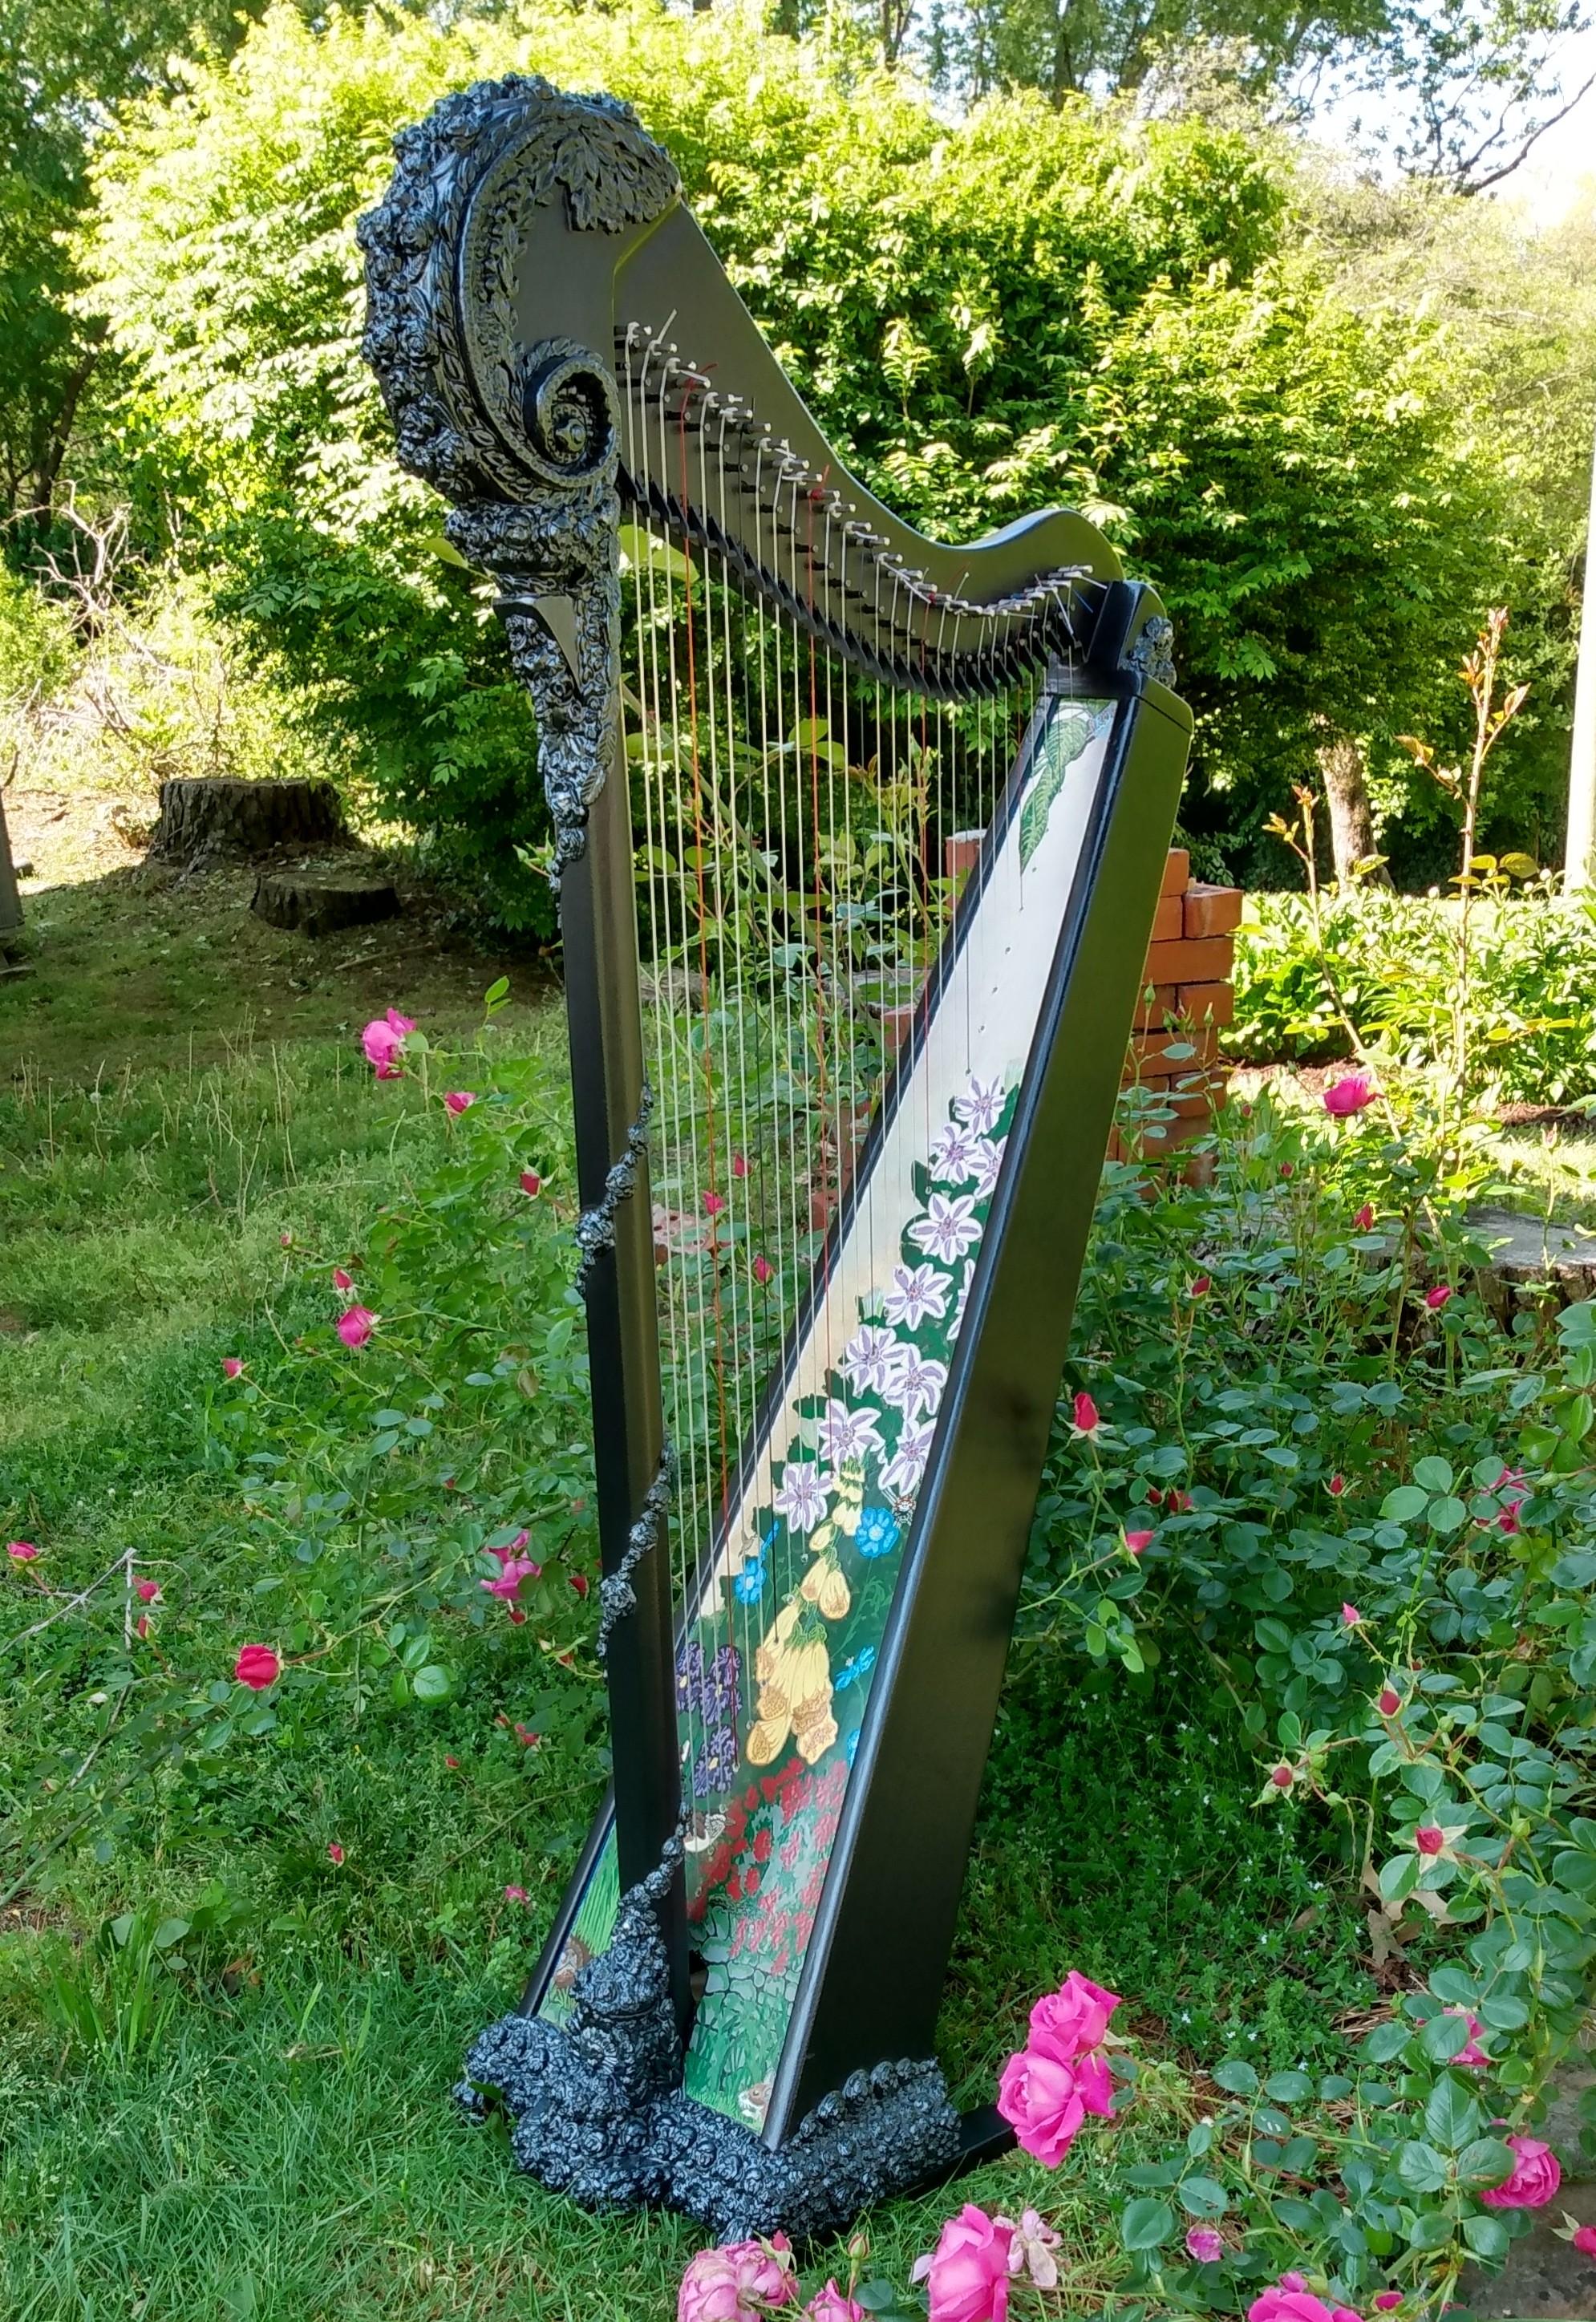 onyx-in-the-garden-from-amy-vining.jpg